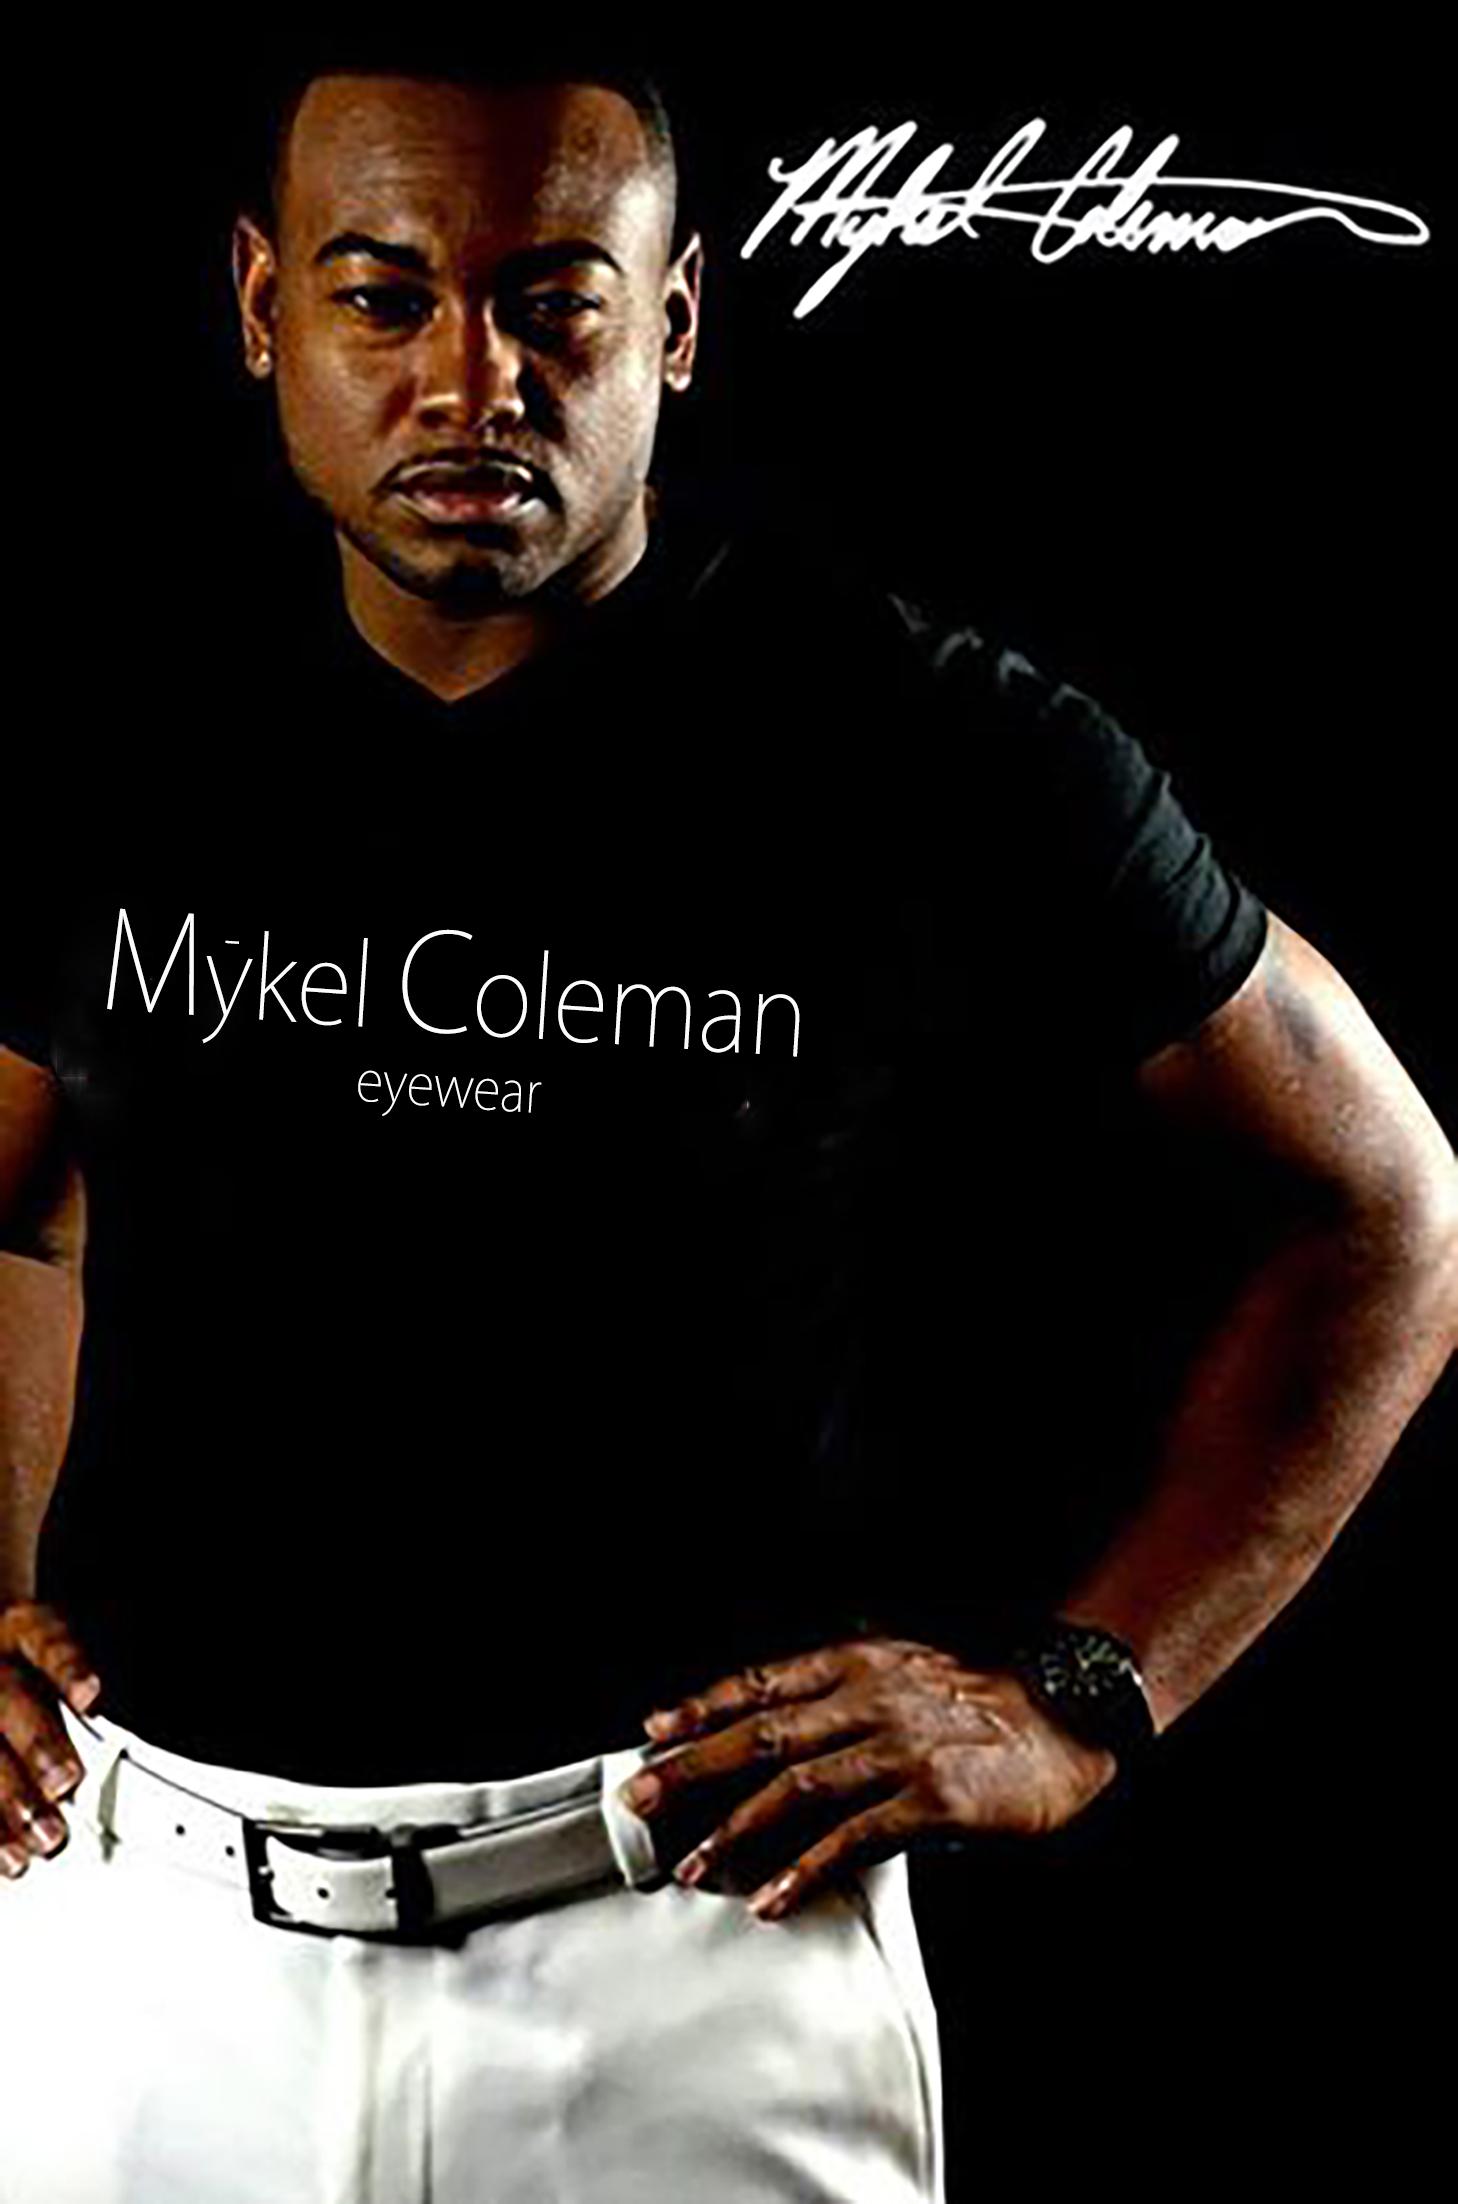 Mykel Coleman Eyewear Shirt